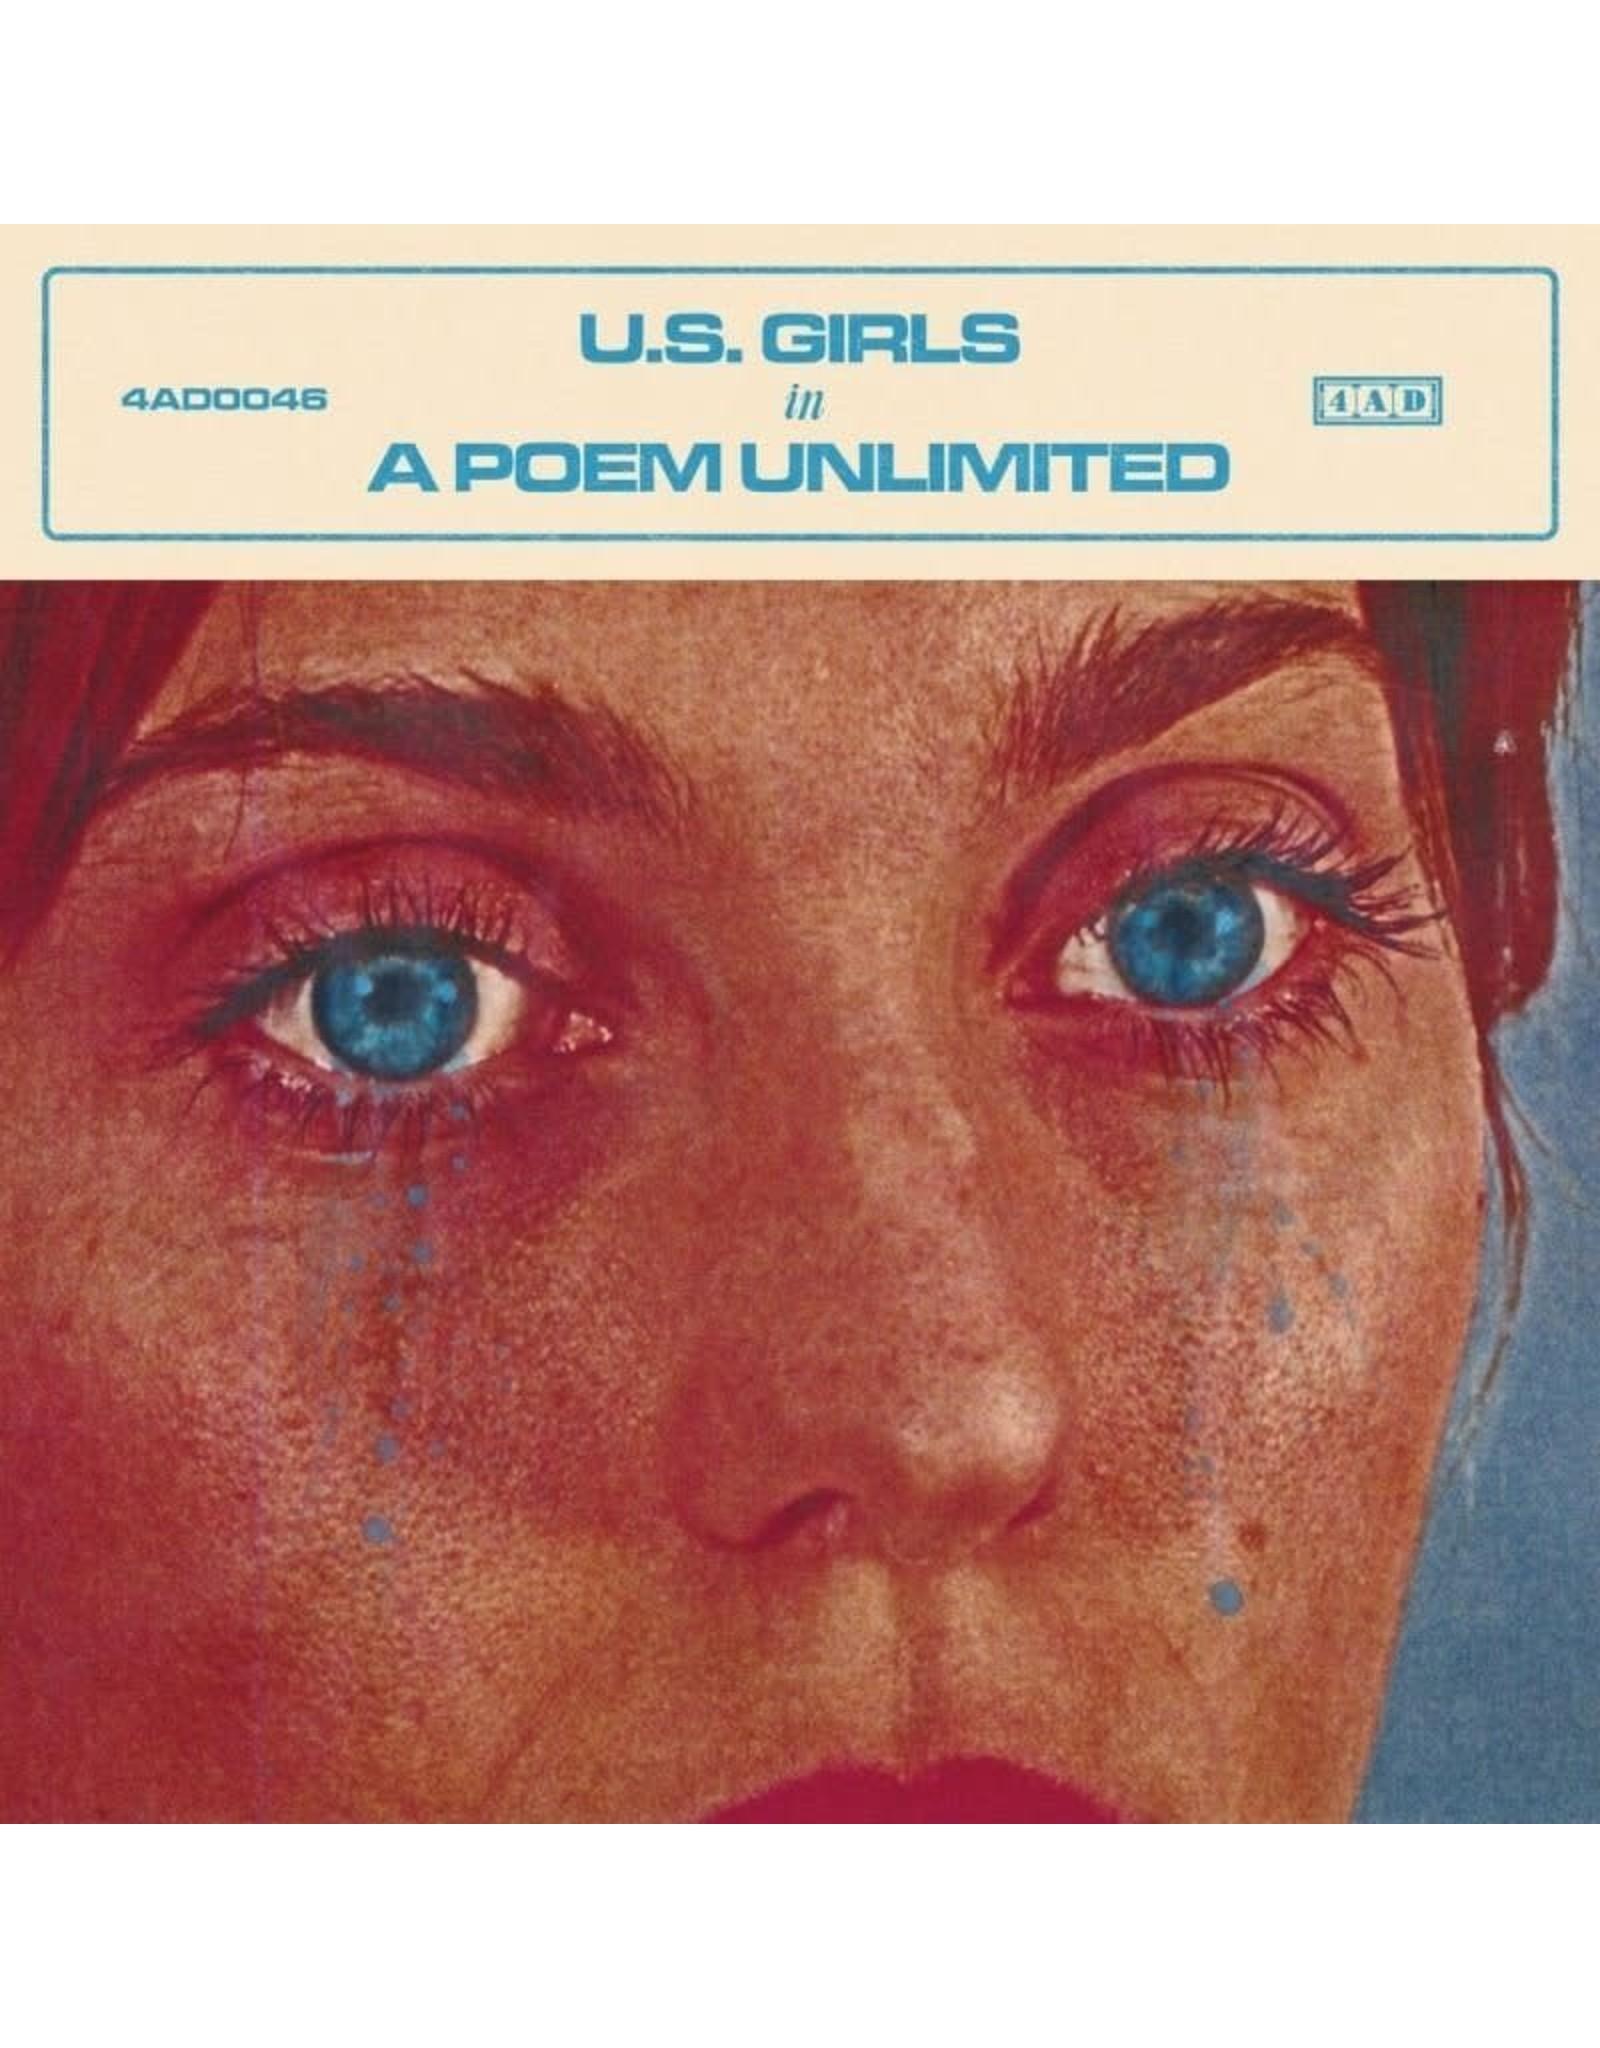 U.S. Girls - A Poem Unlimited LP